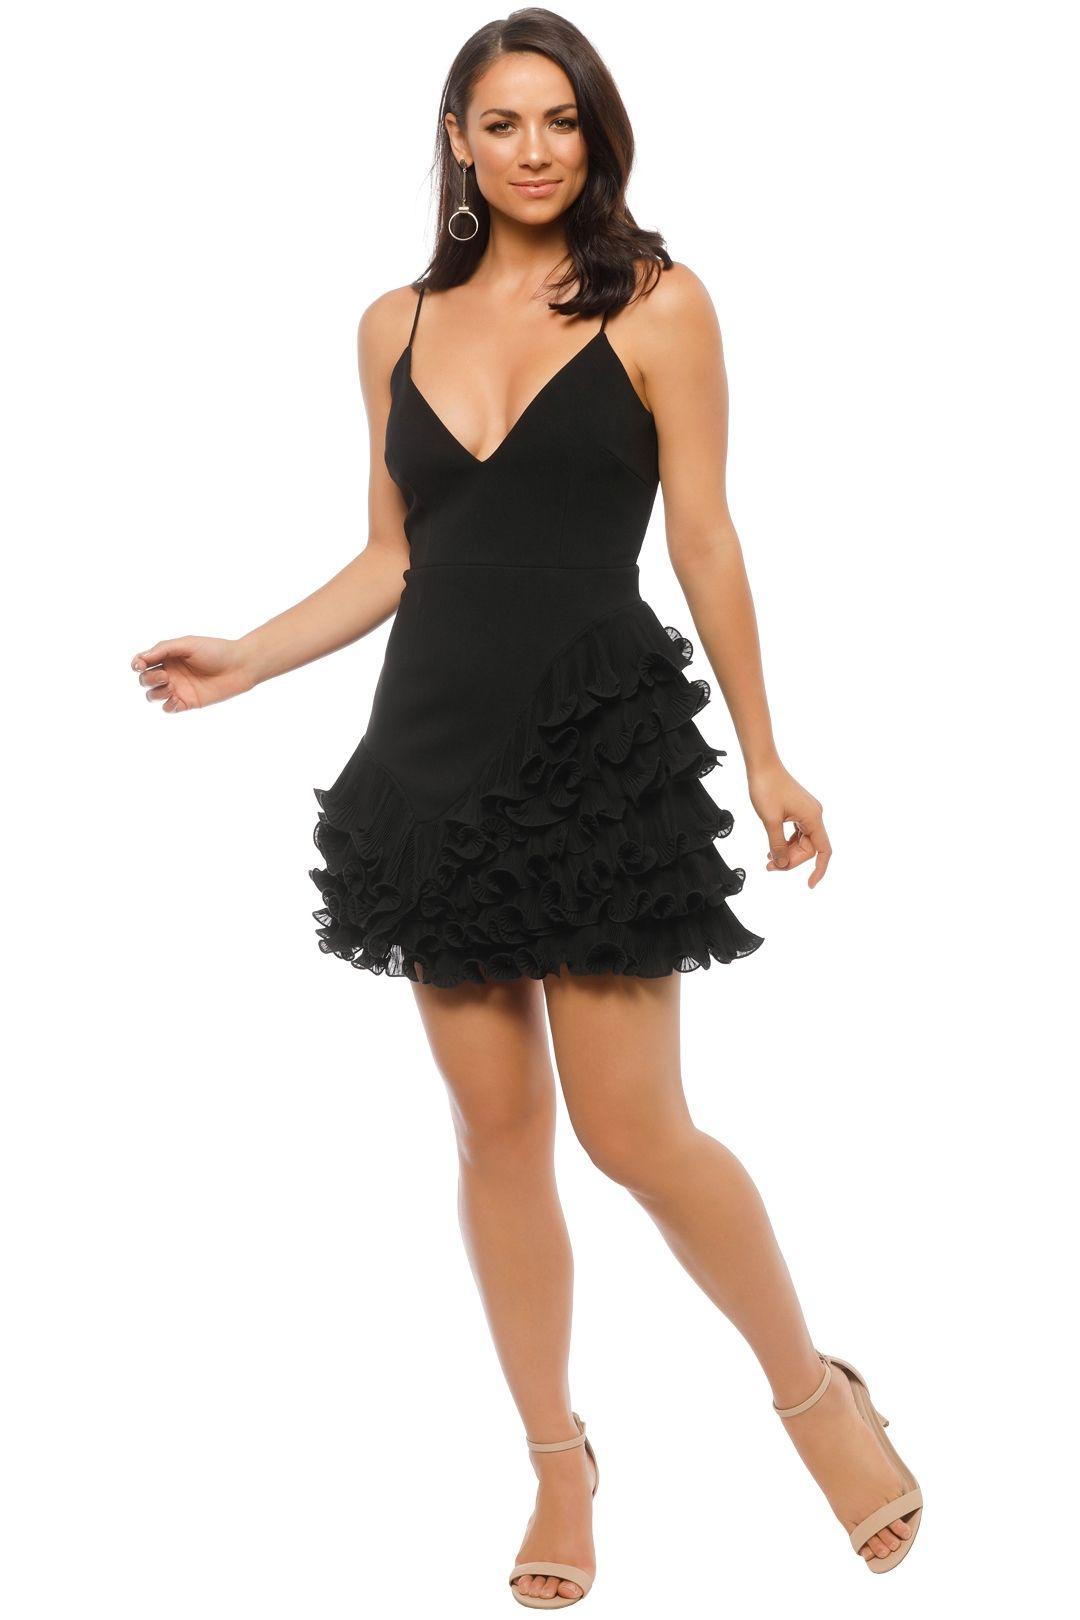 Talulah - Golda Ruffle Mini Dress - Black - Front